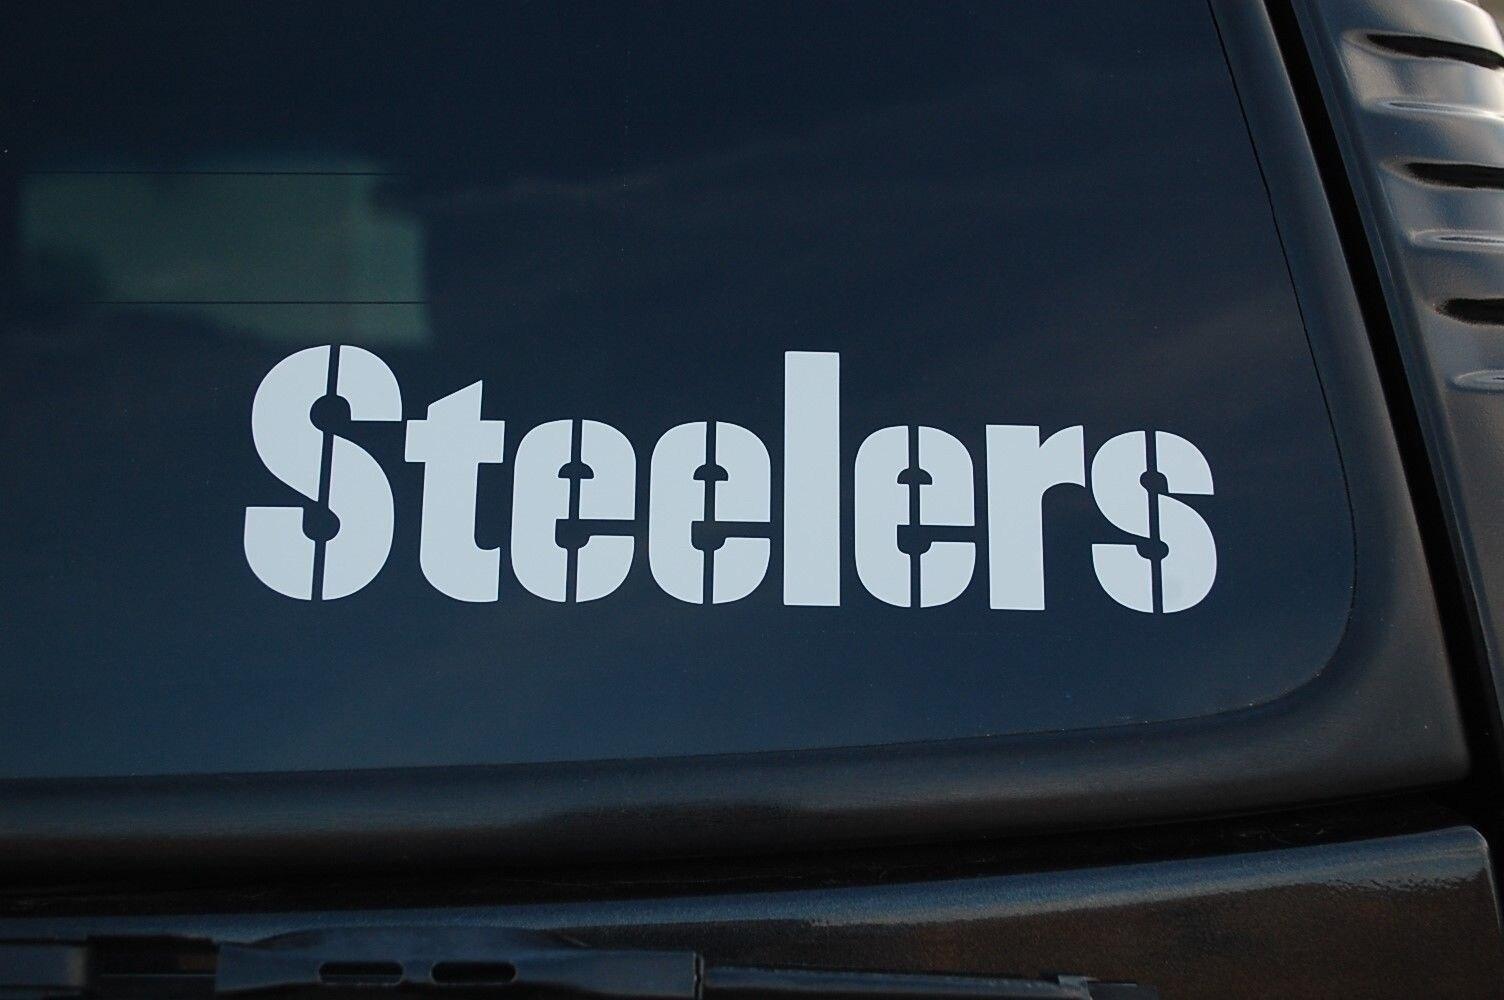 Pegatina de vinilo Steelers, pegatinas de fútbol de alta calidad para coche, portátil, motocicleta 15cm